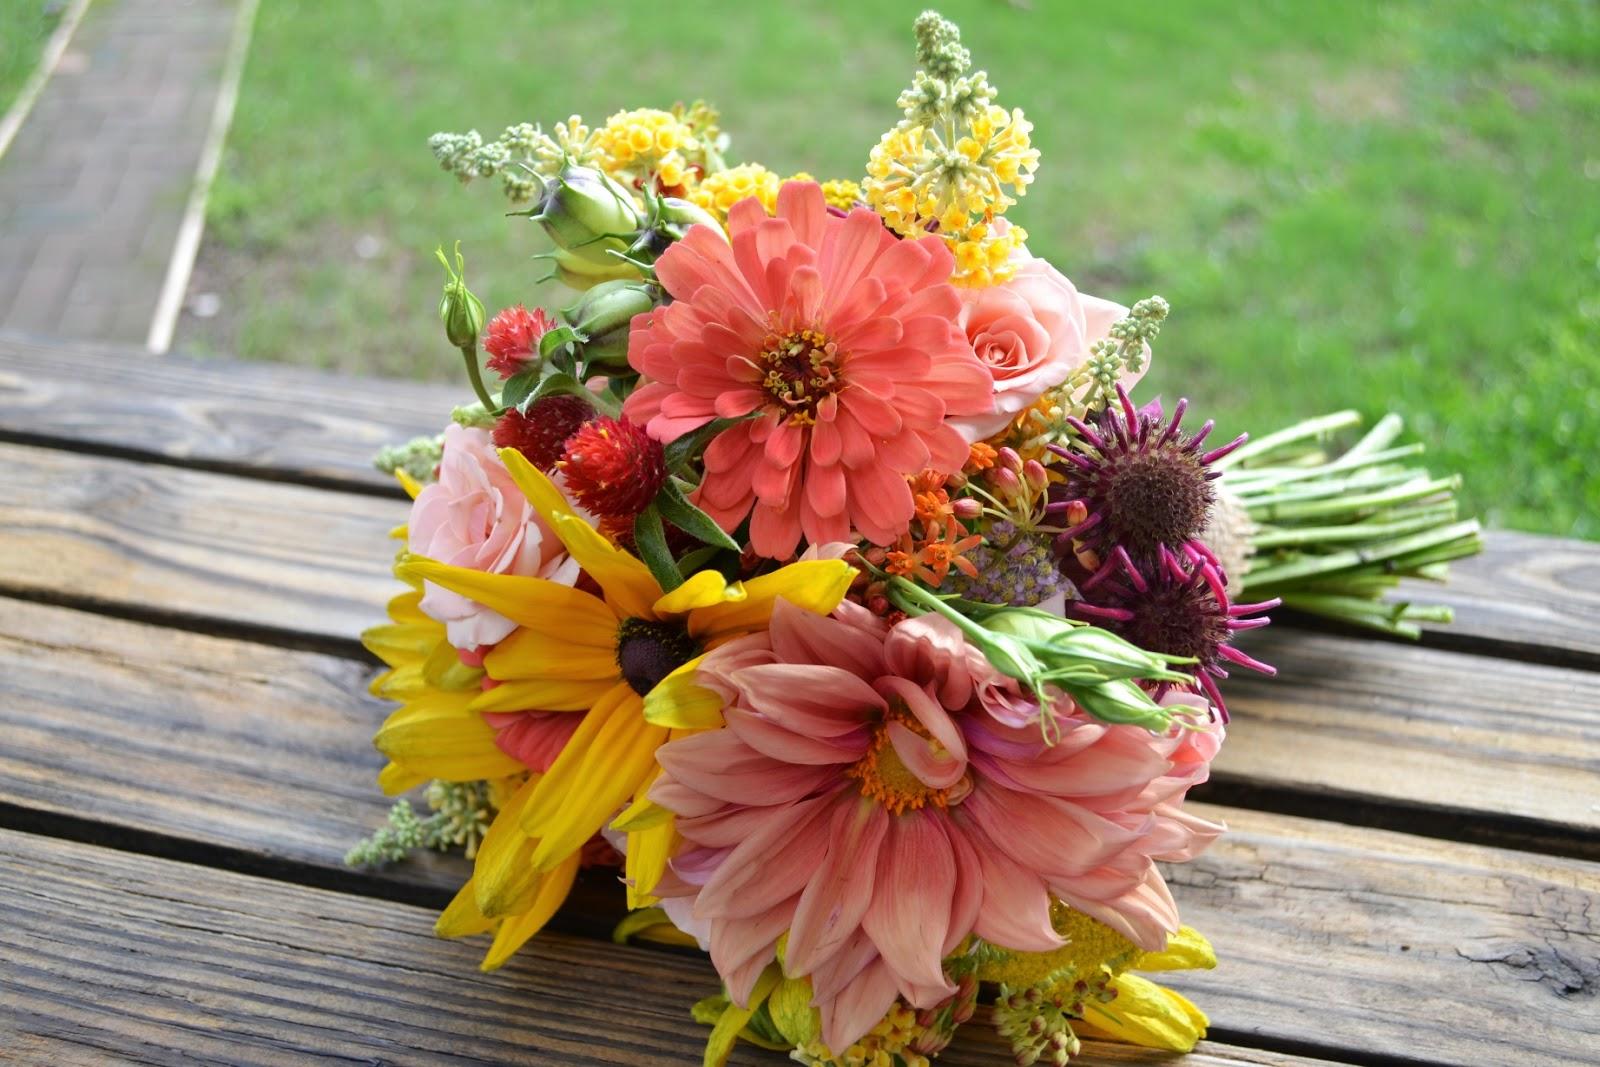 Wedding Flowers From Springwell: Peach Dahlias And Zinnias